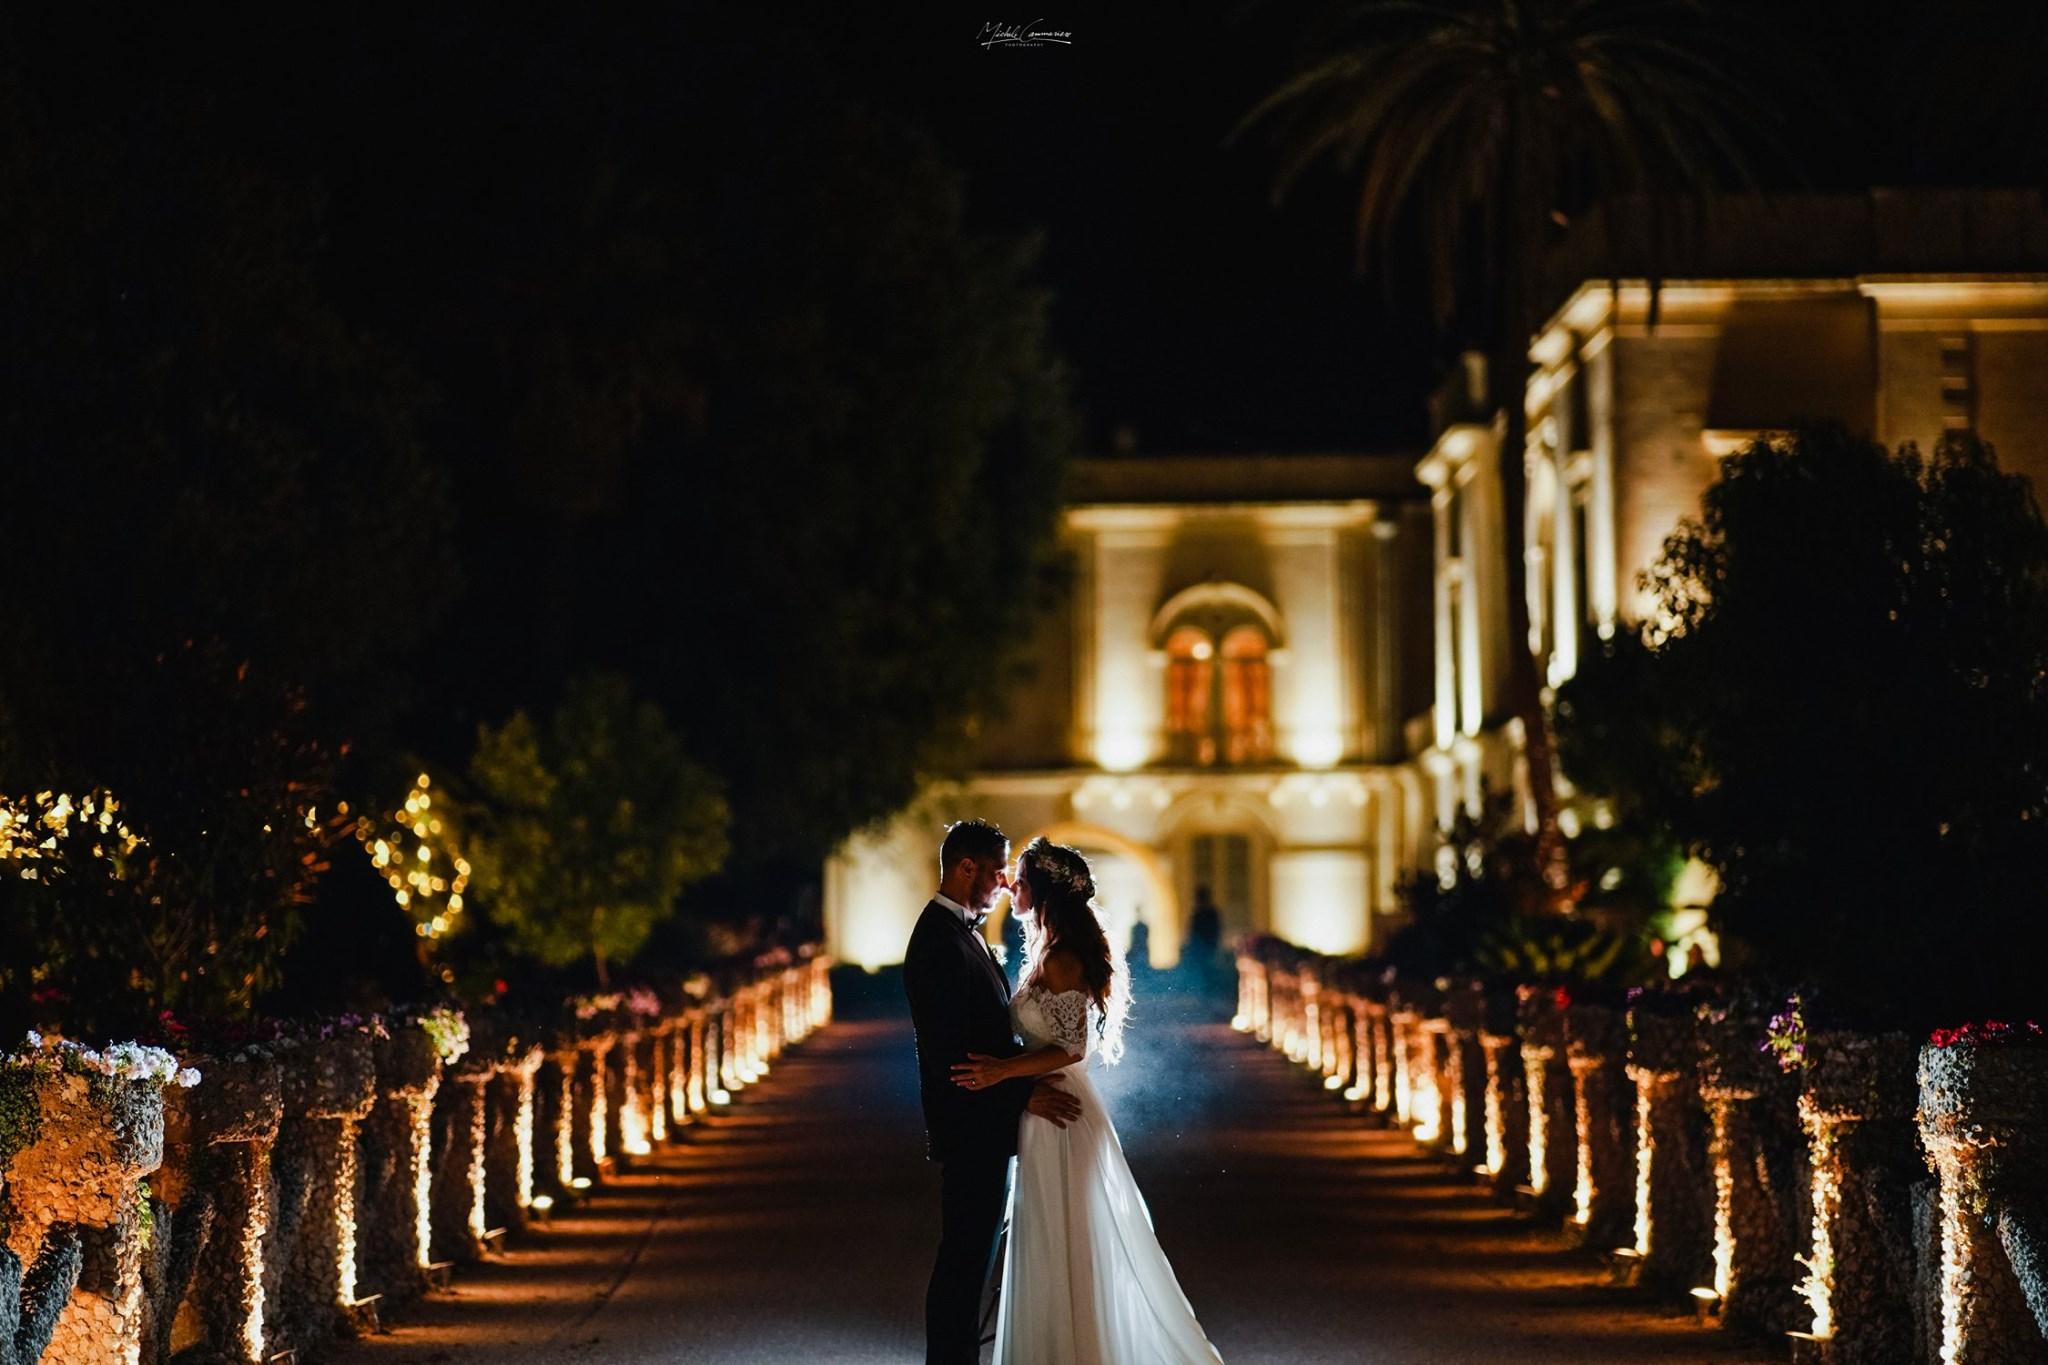 Villa Zaira wedding location in Salento